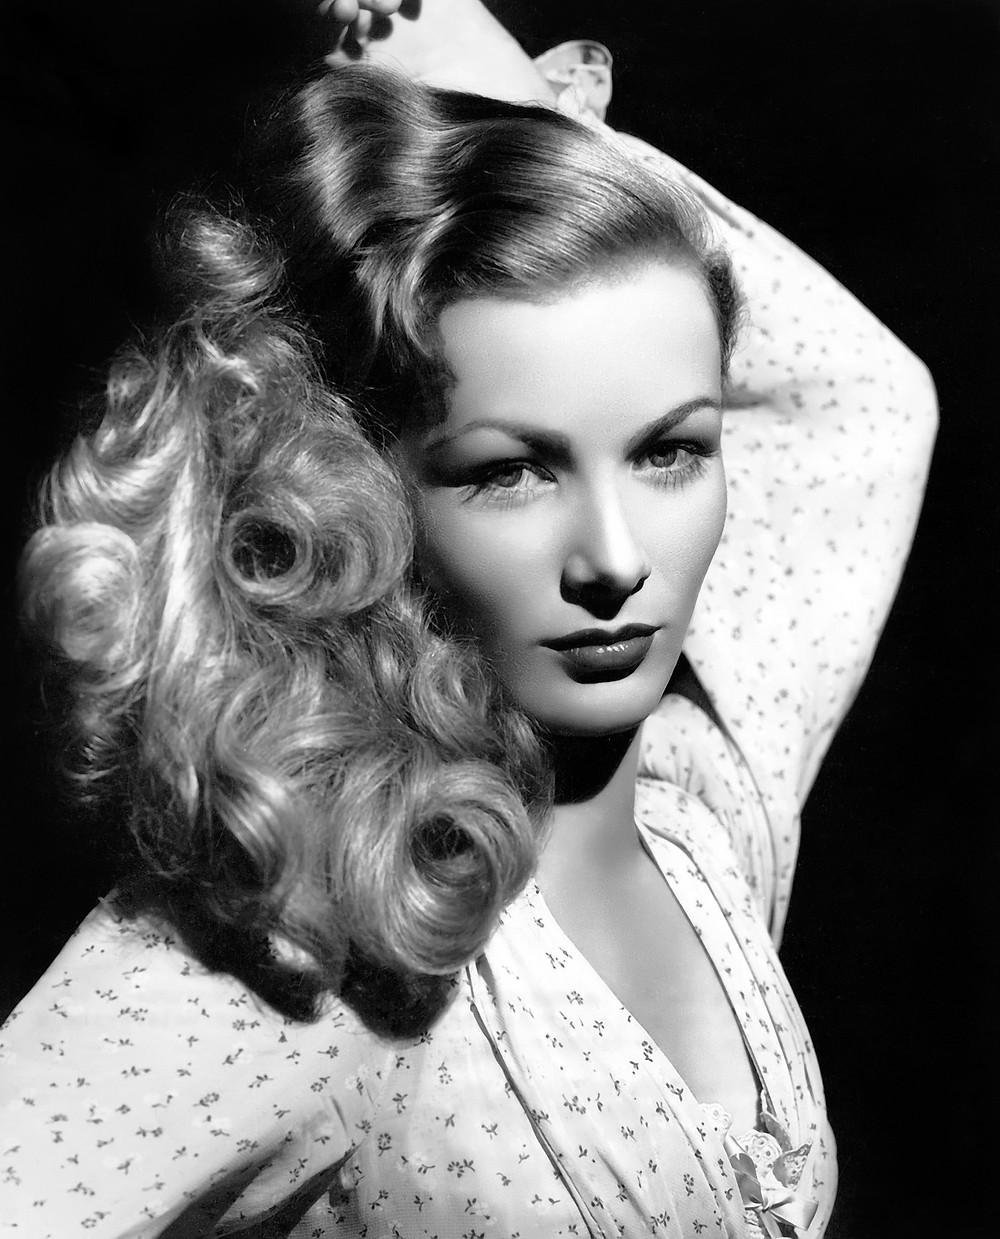 Veronica Lake bustershot, 1952, MGM